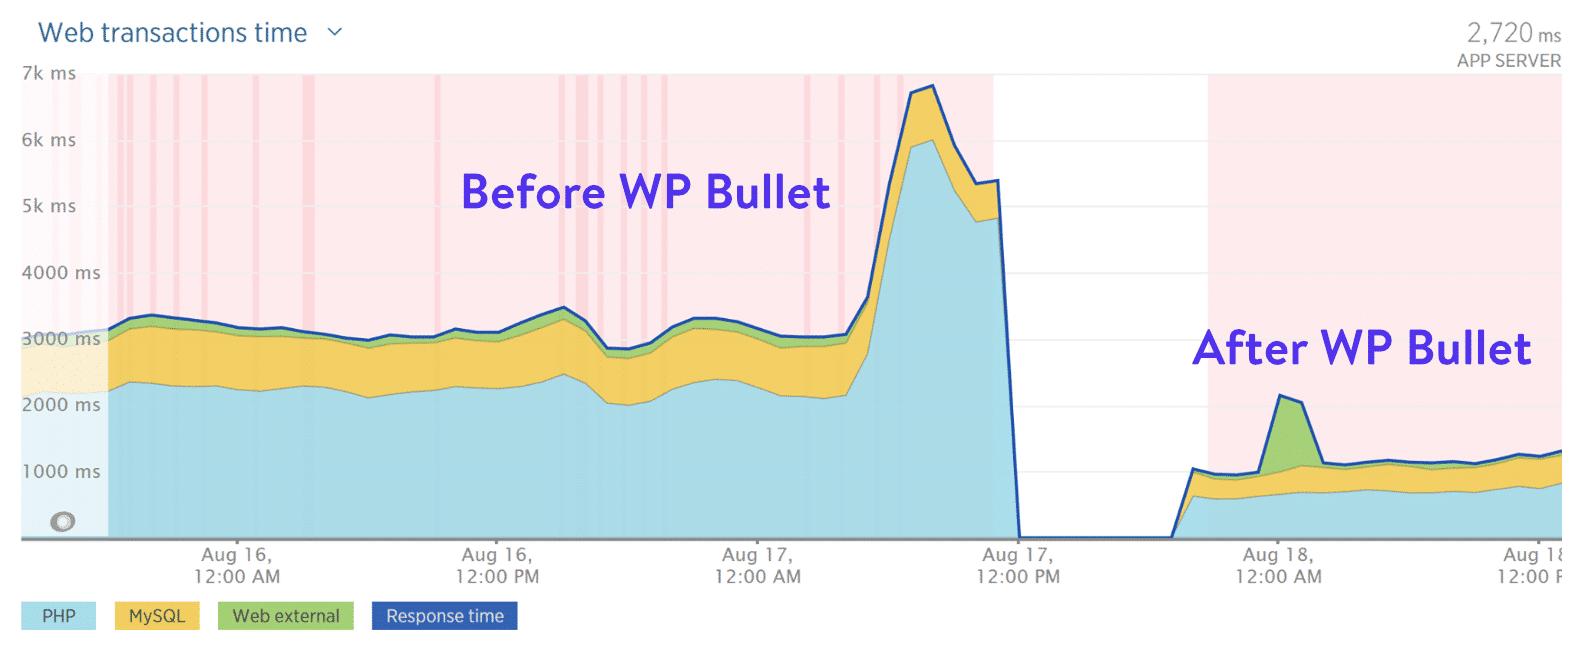 Prima e dopo WP Bullet